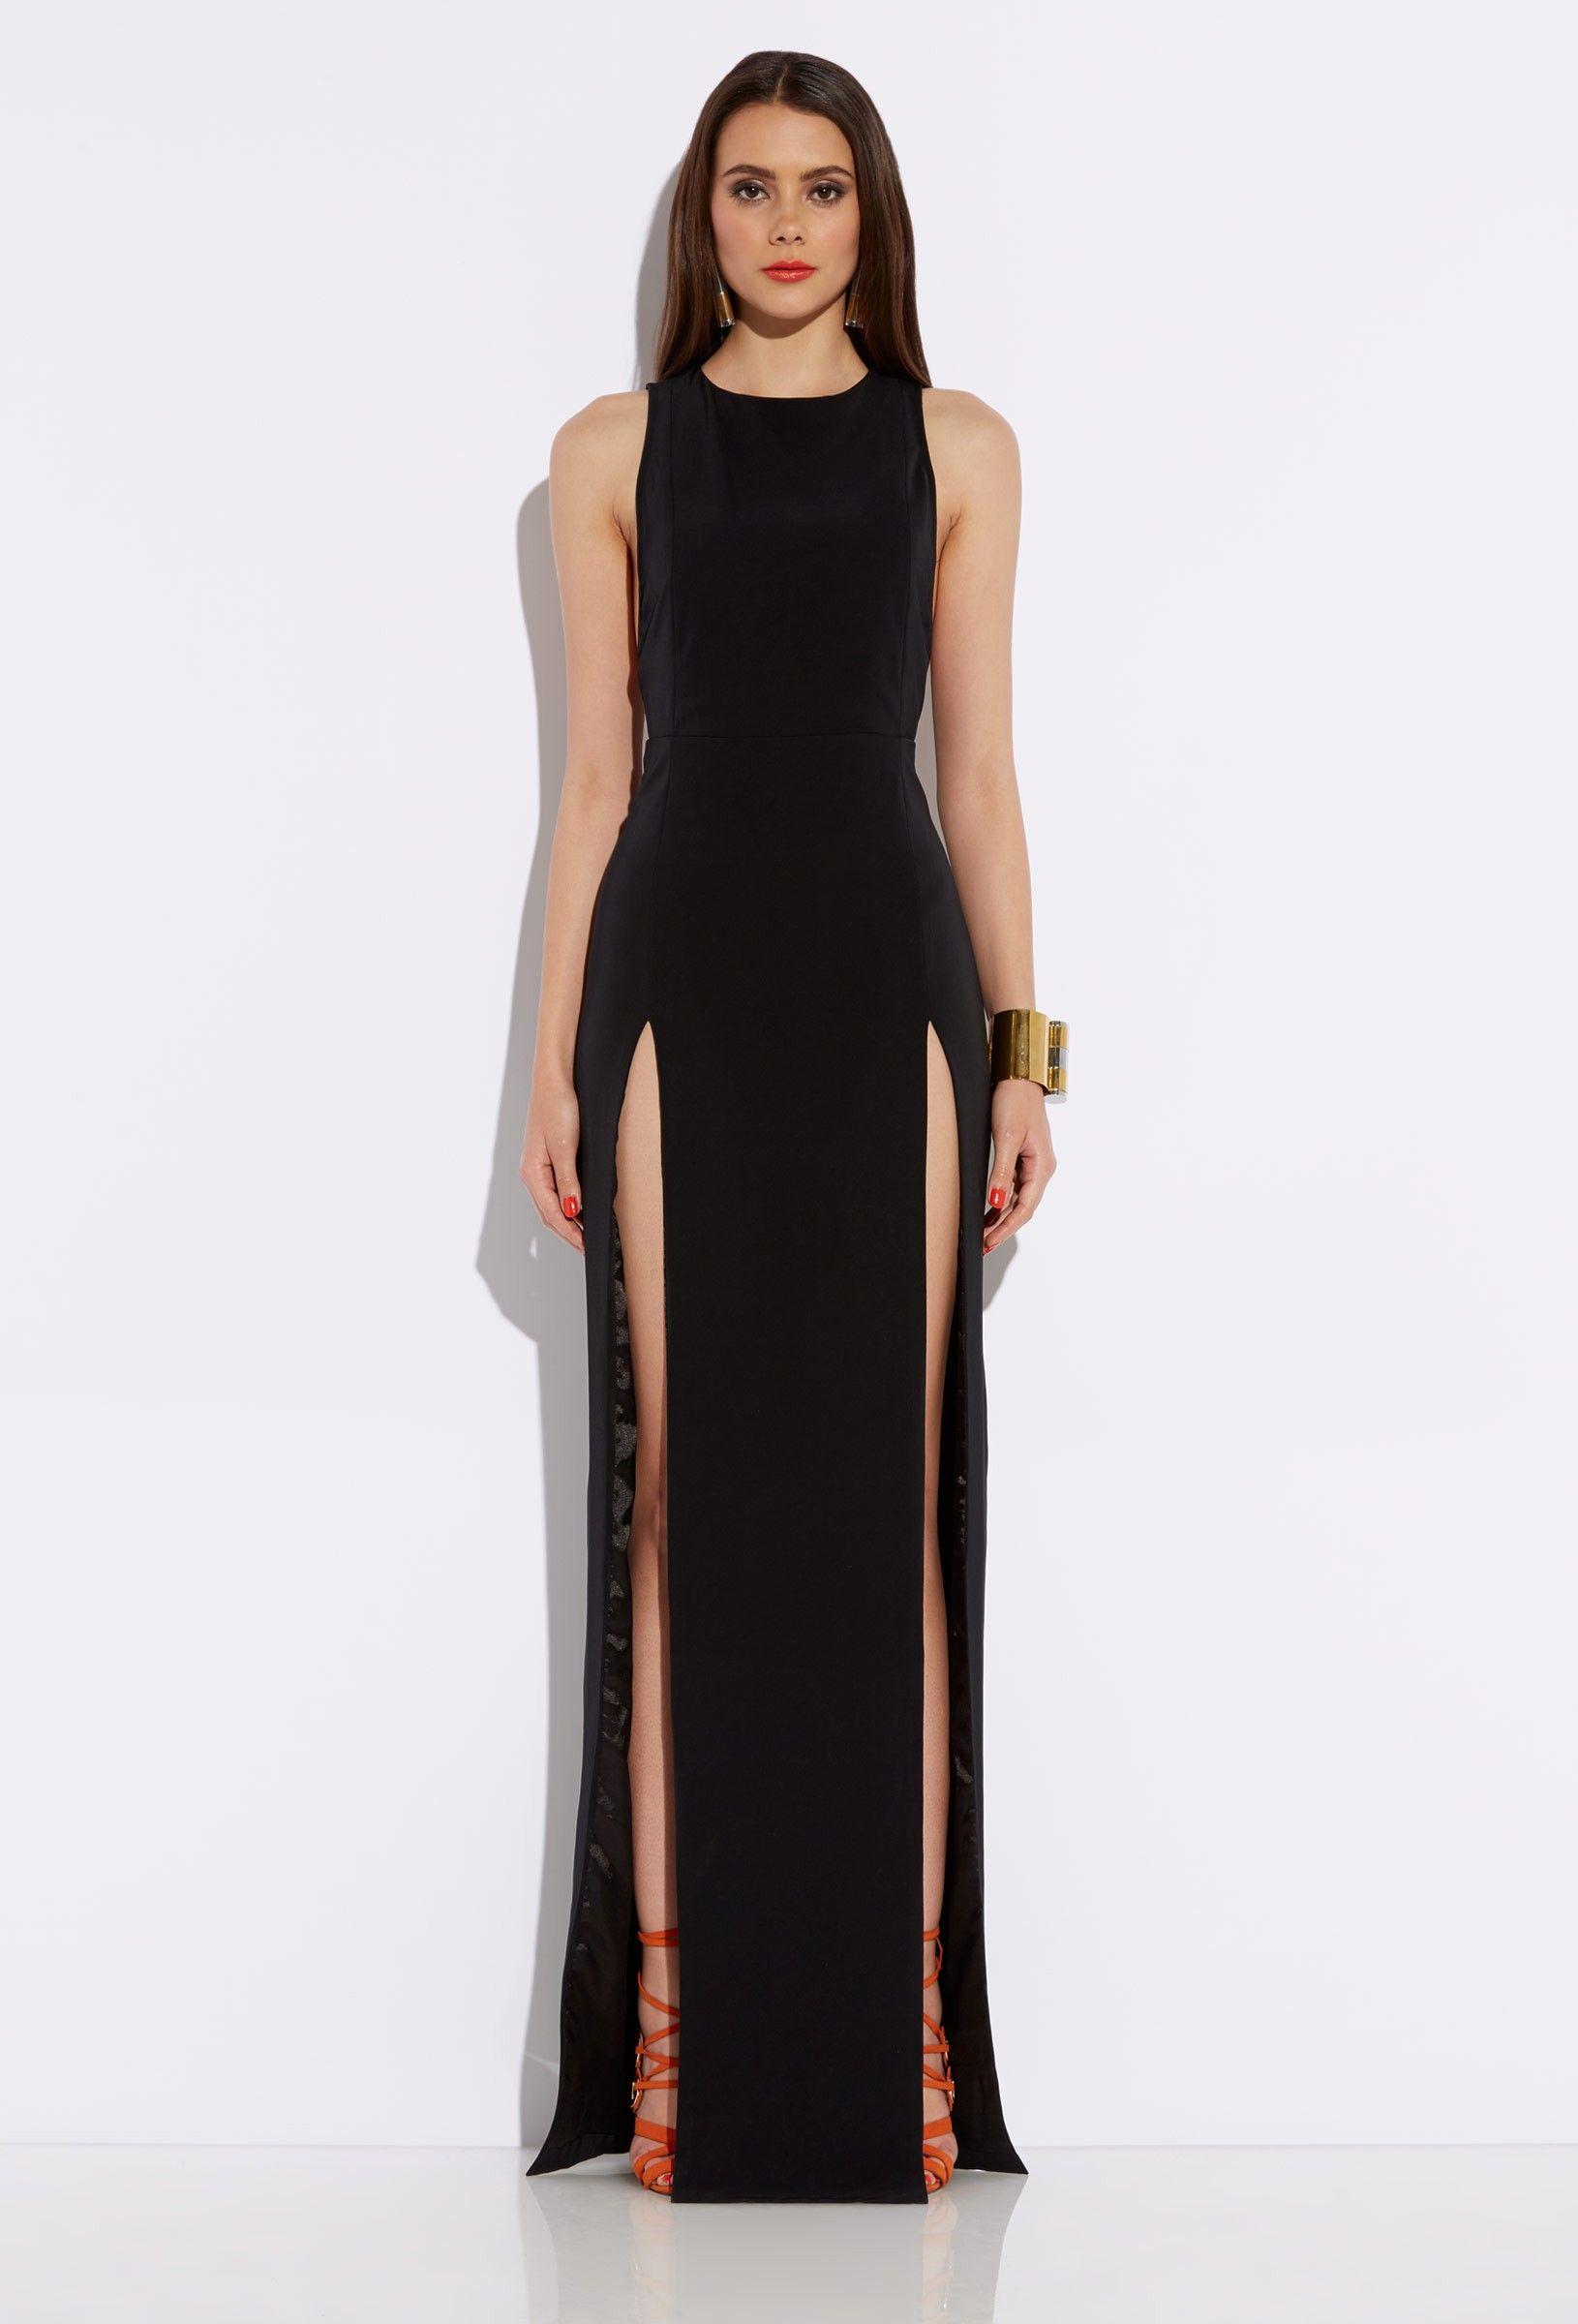 Maxi Dress With Slit Gommap Blog Maxi Dresses Pinterest